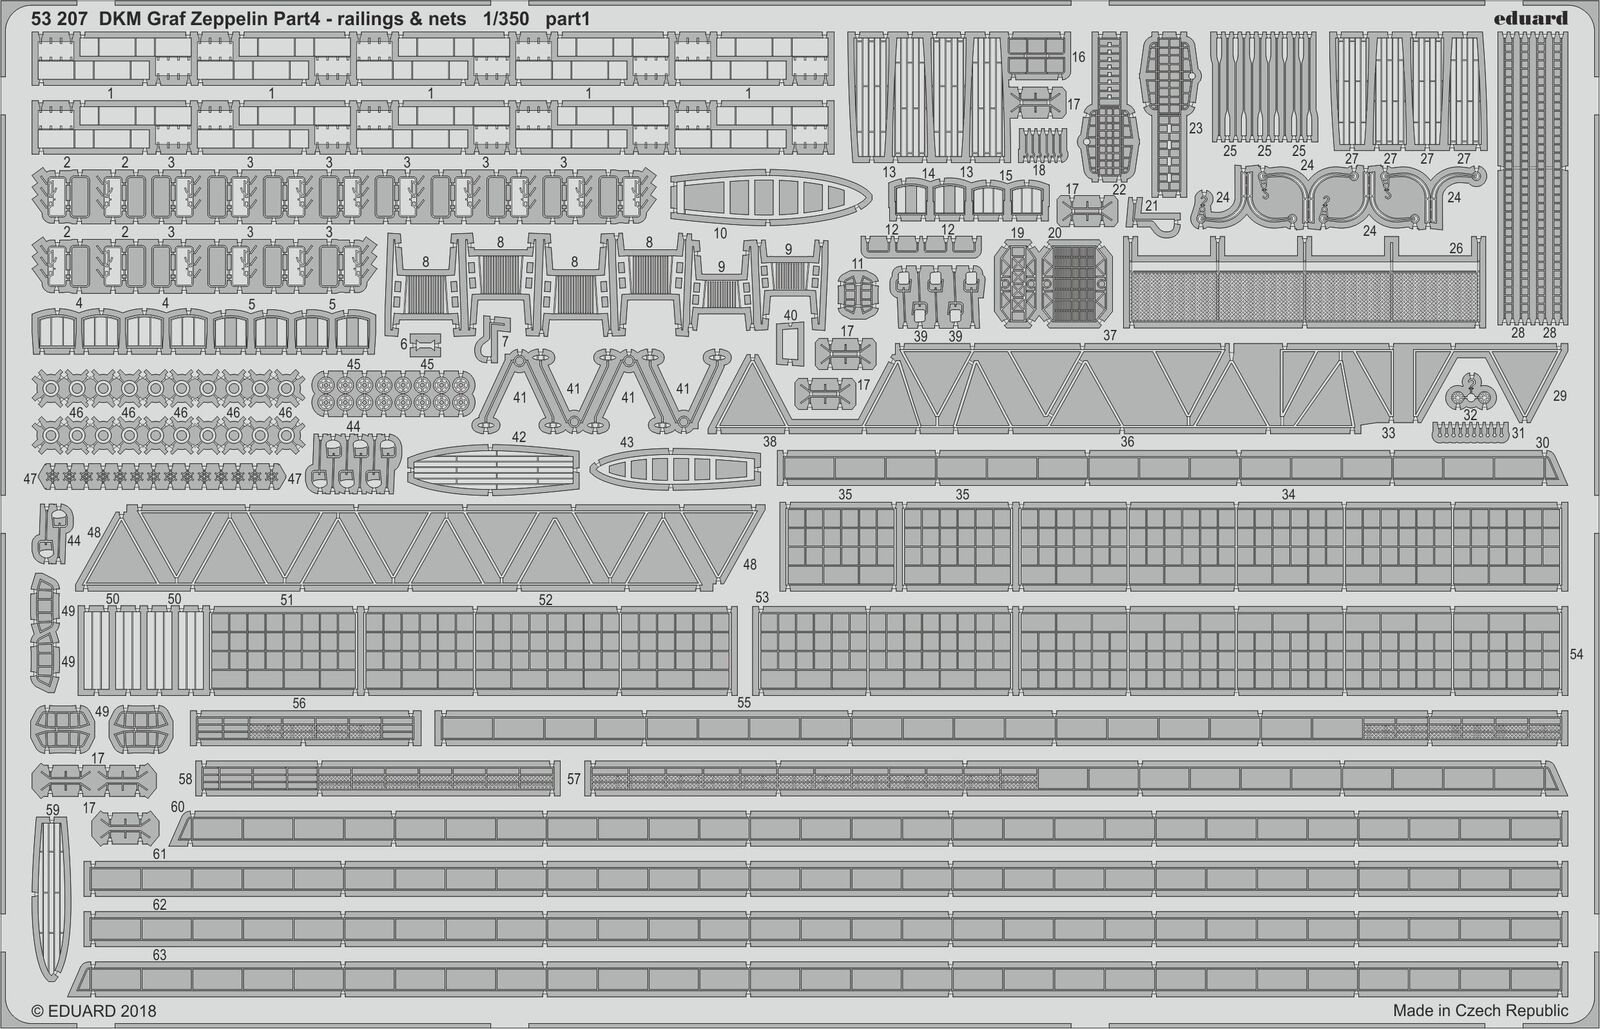 EDUARD 1 350 DKM Graf Zeppelin PARTE 4 - Ringhiere & Nets